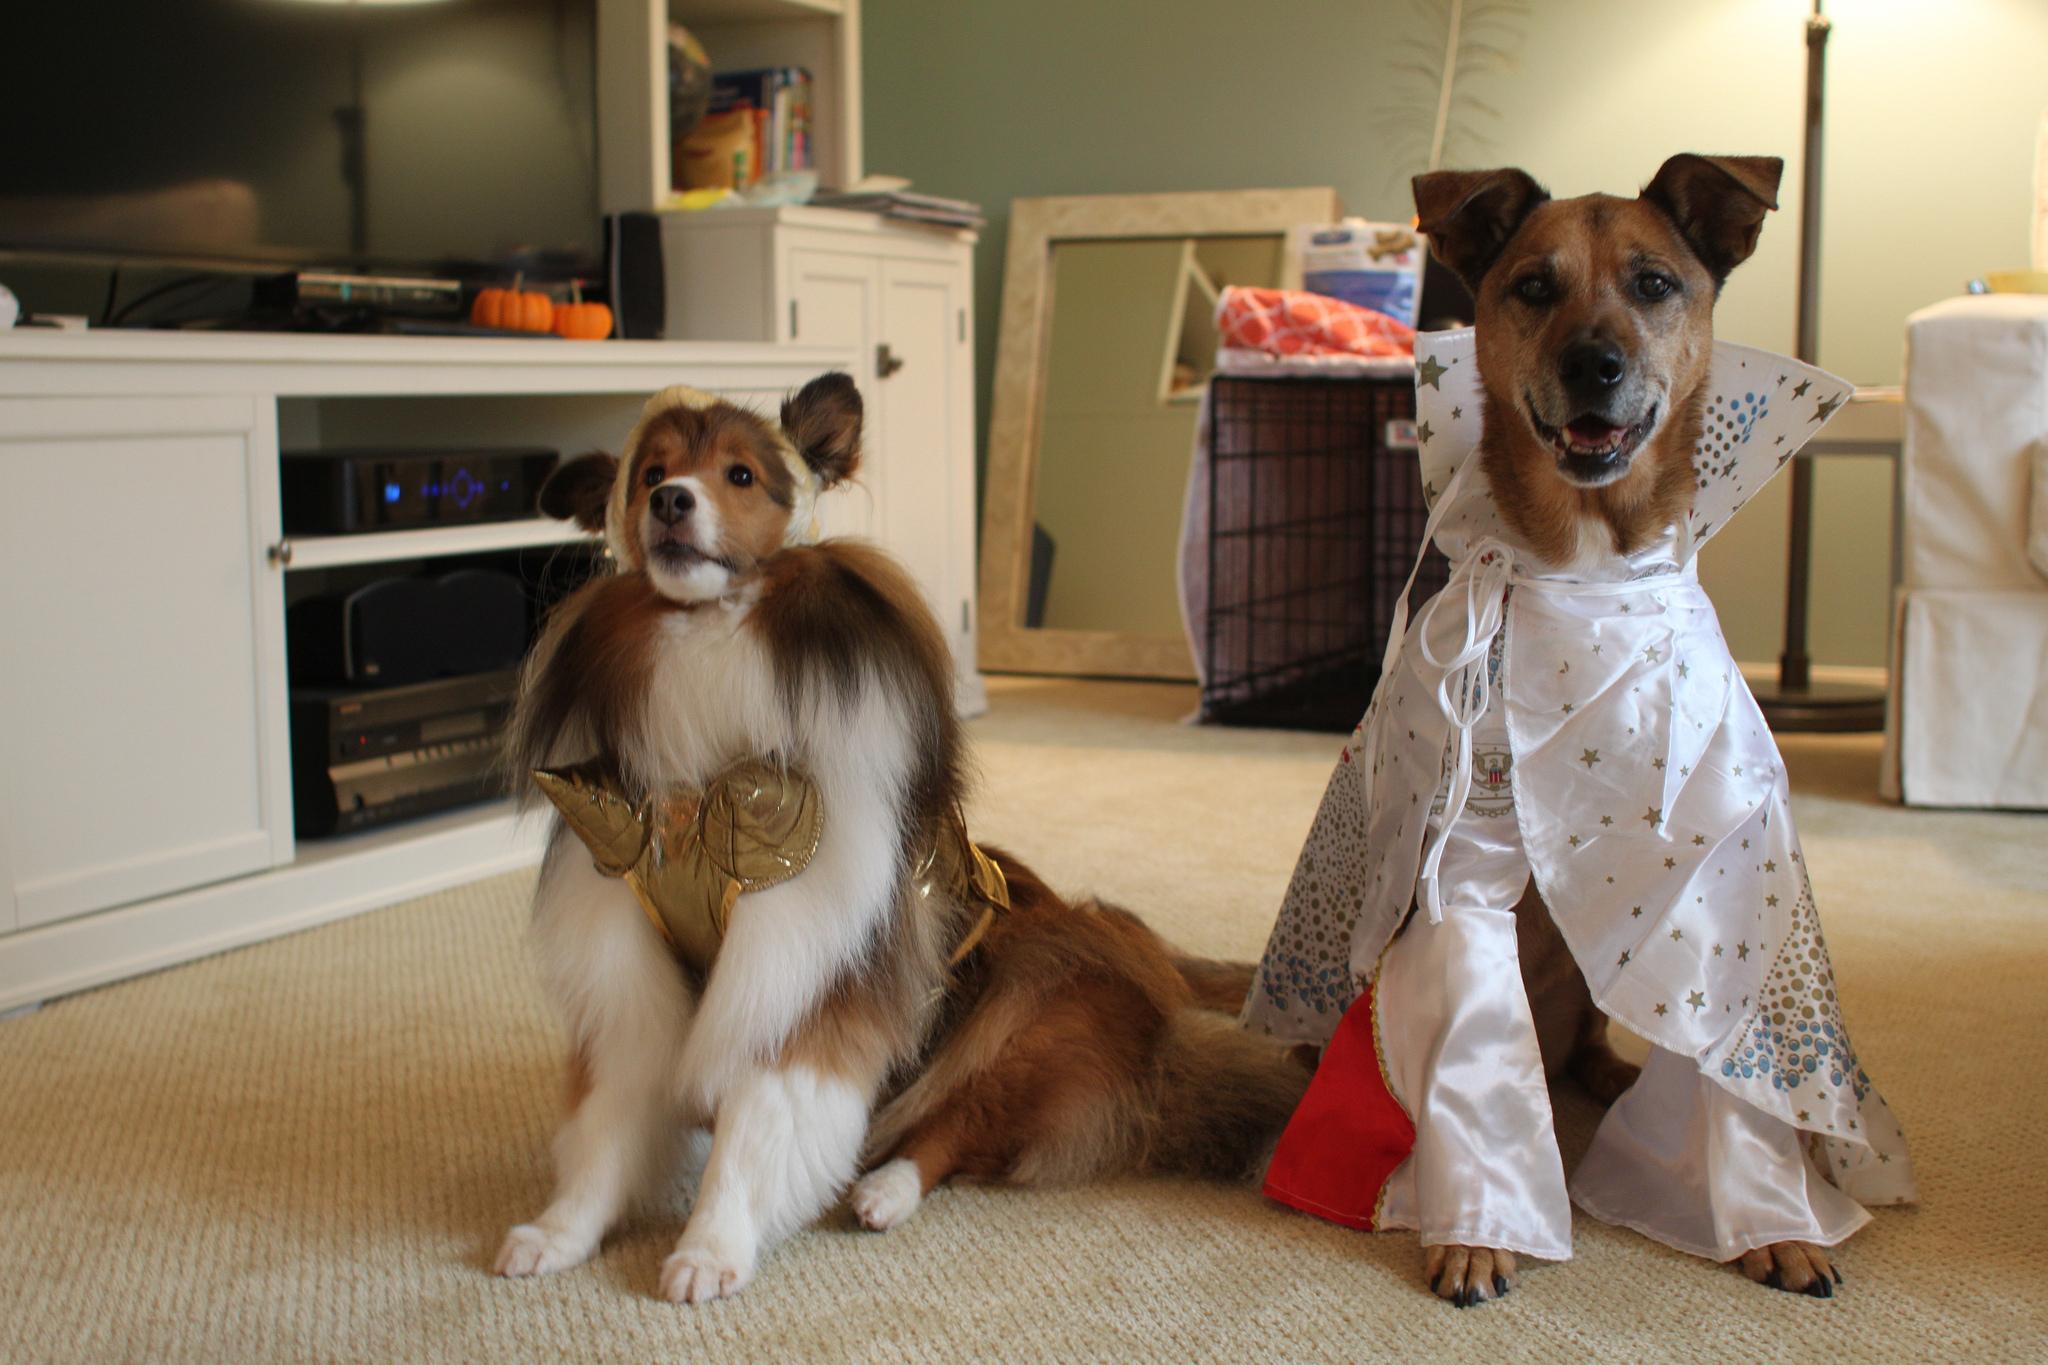 Homemade female dog costumes - photo#9